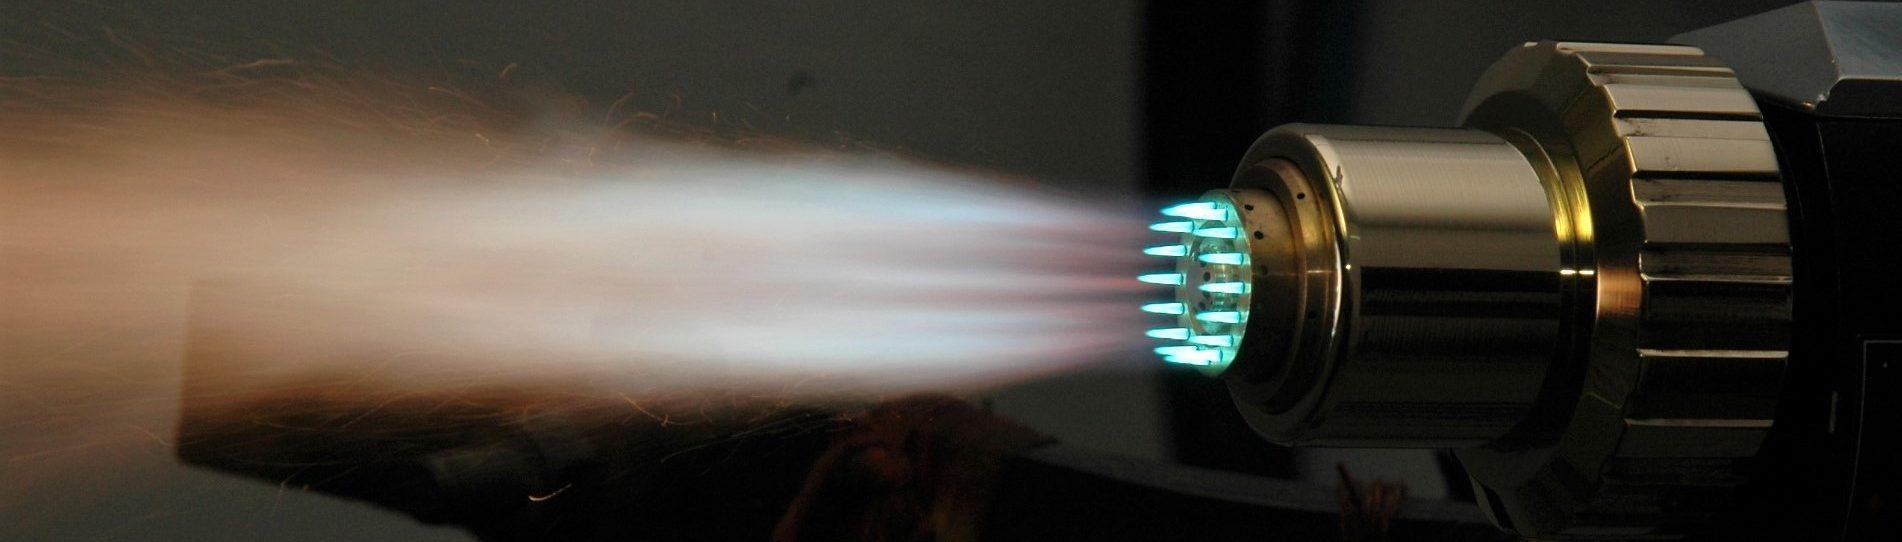 Thermal Spray Coatings Metallizing Export Company Llp